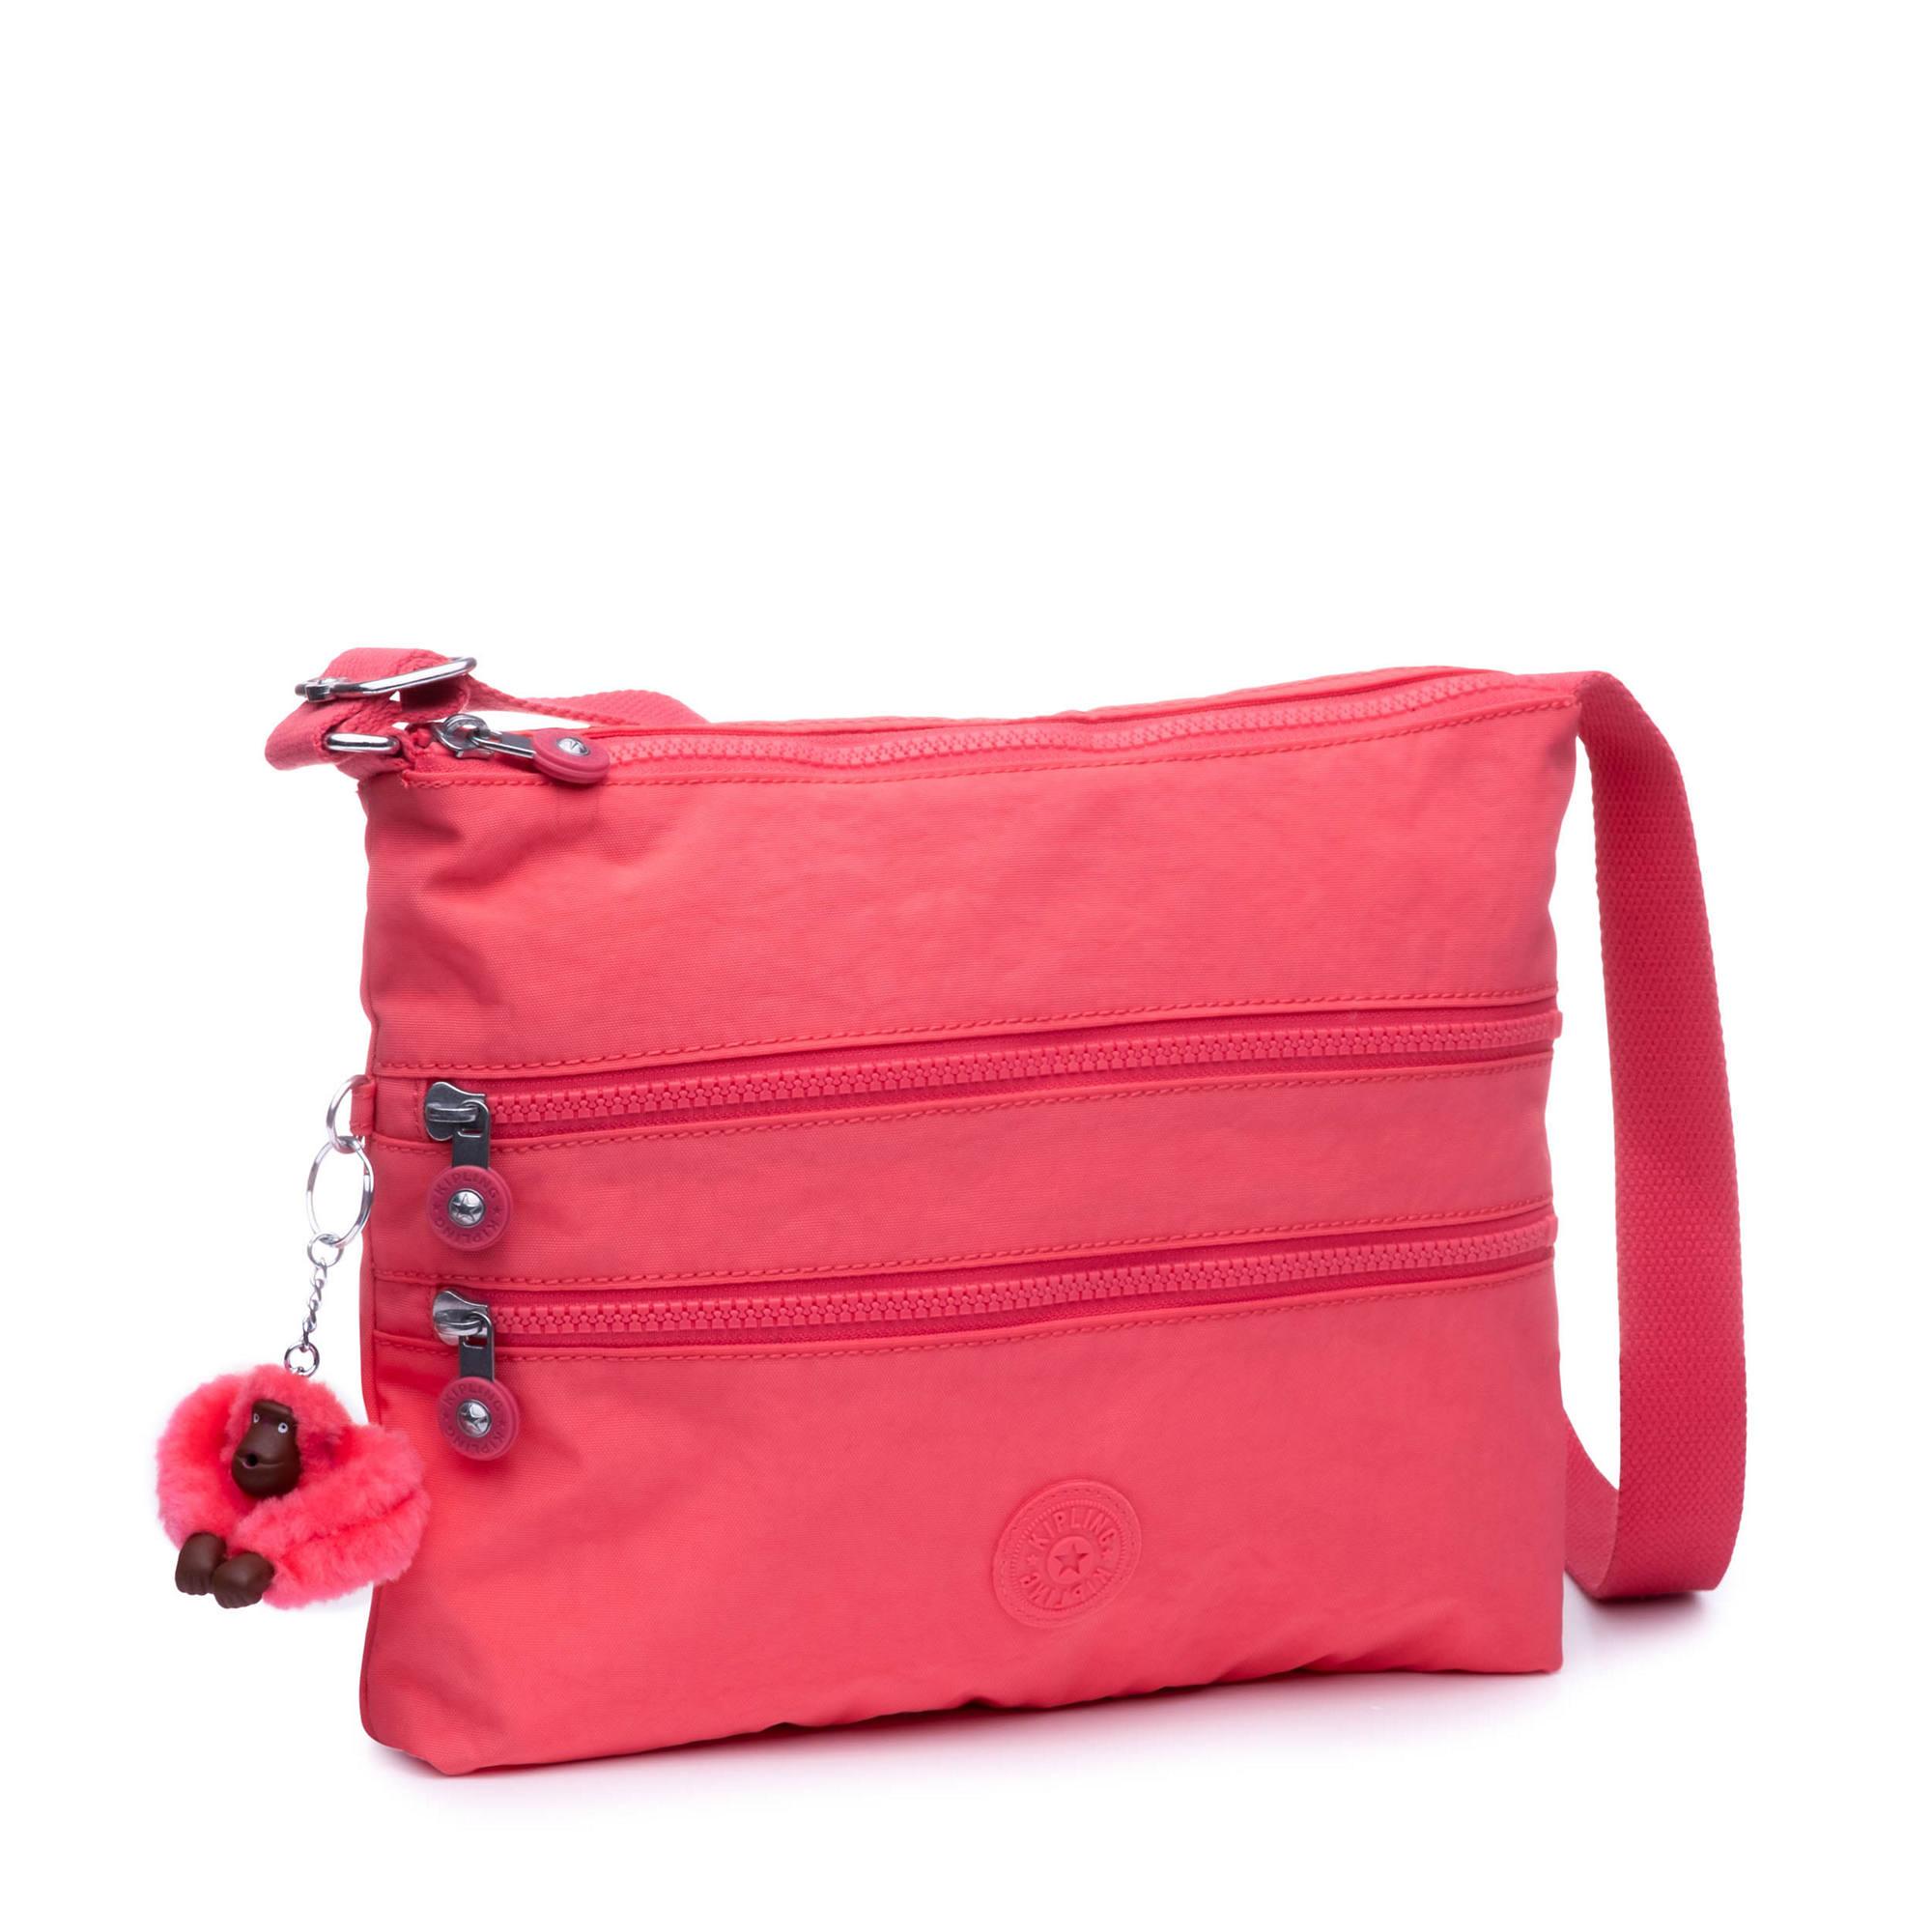 Kipling-Alvar-Metallic-Crossbody-Bag miniature 26